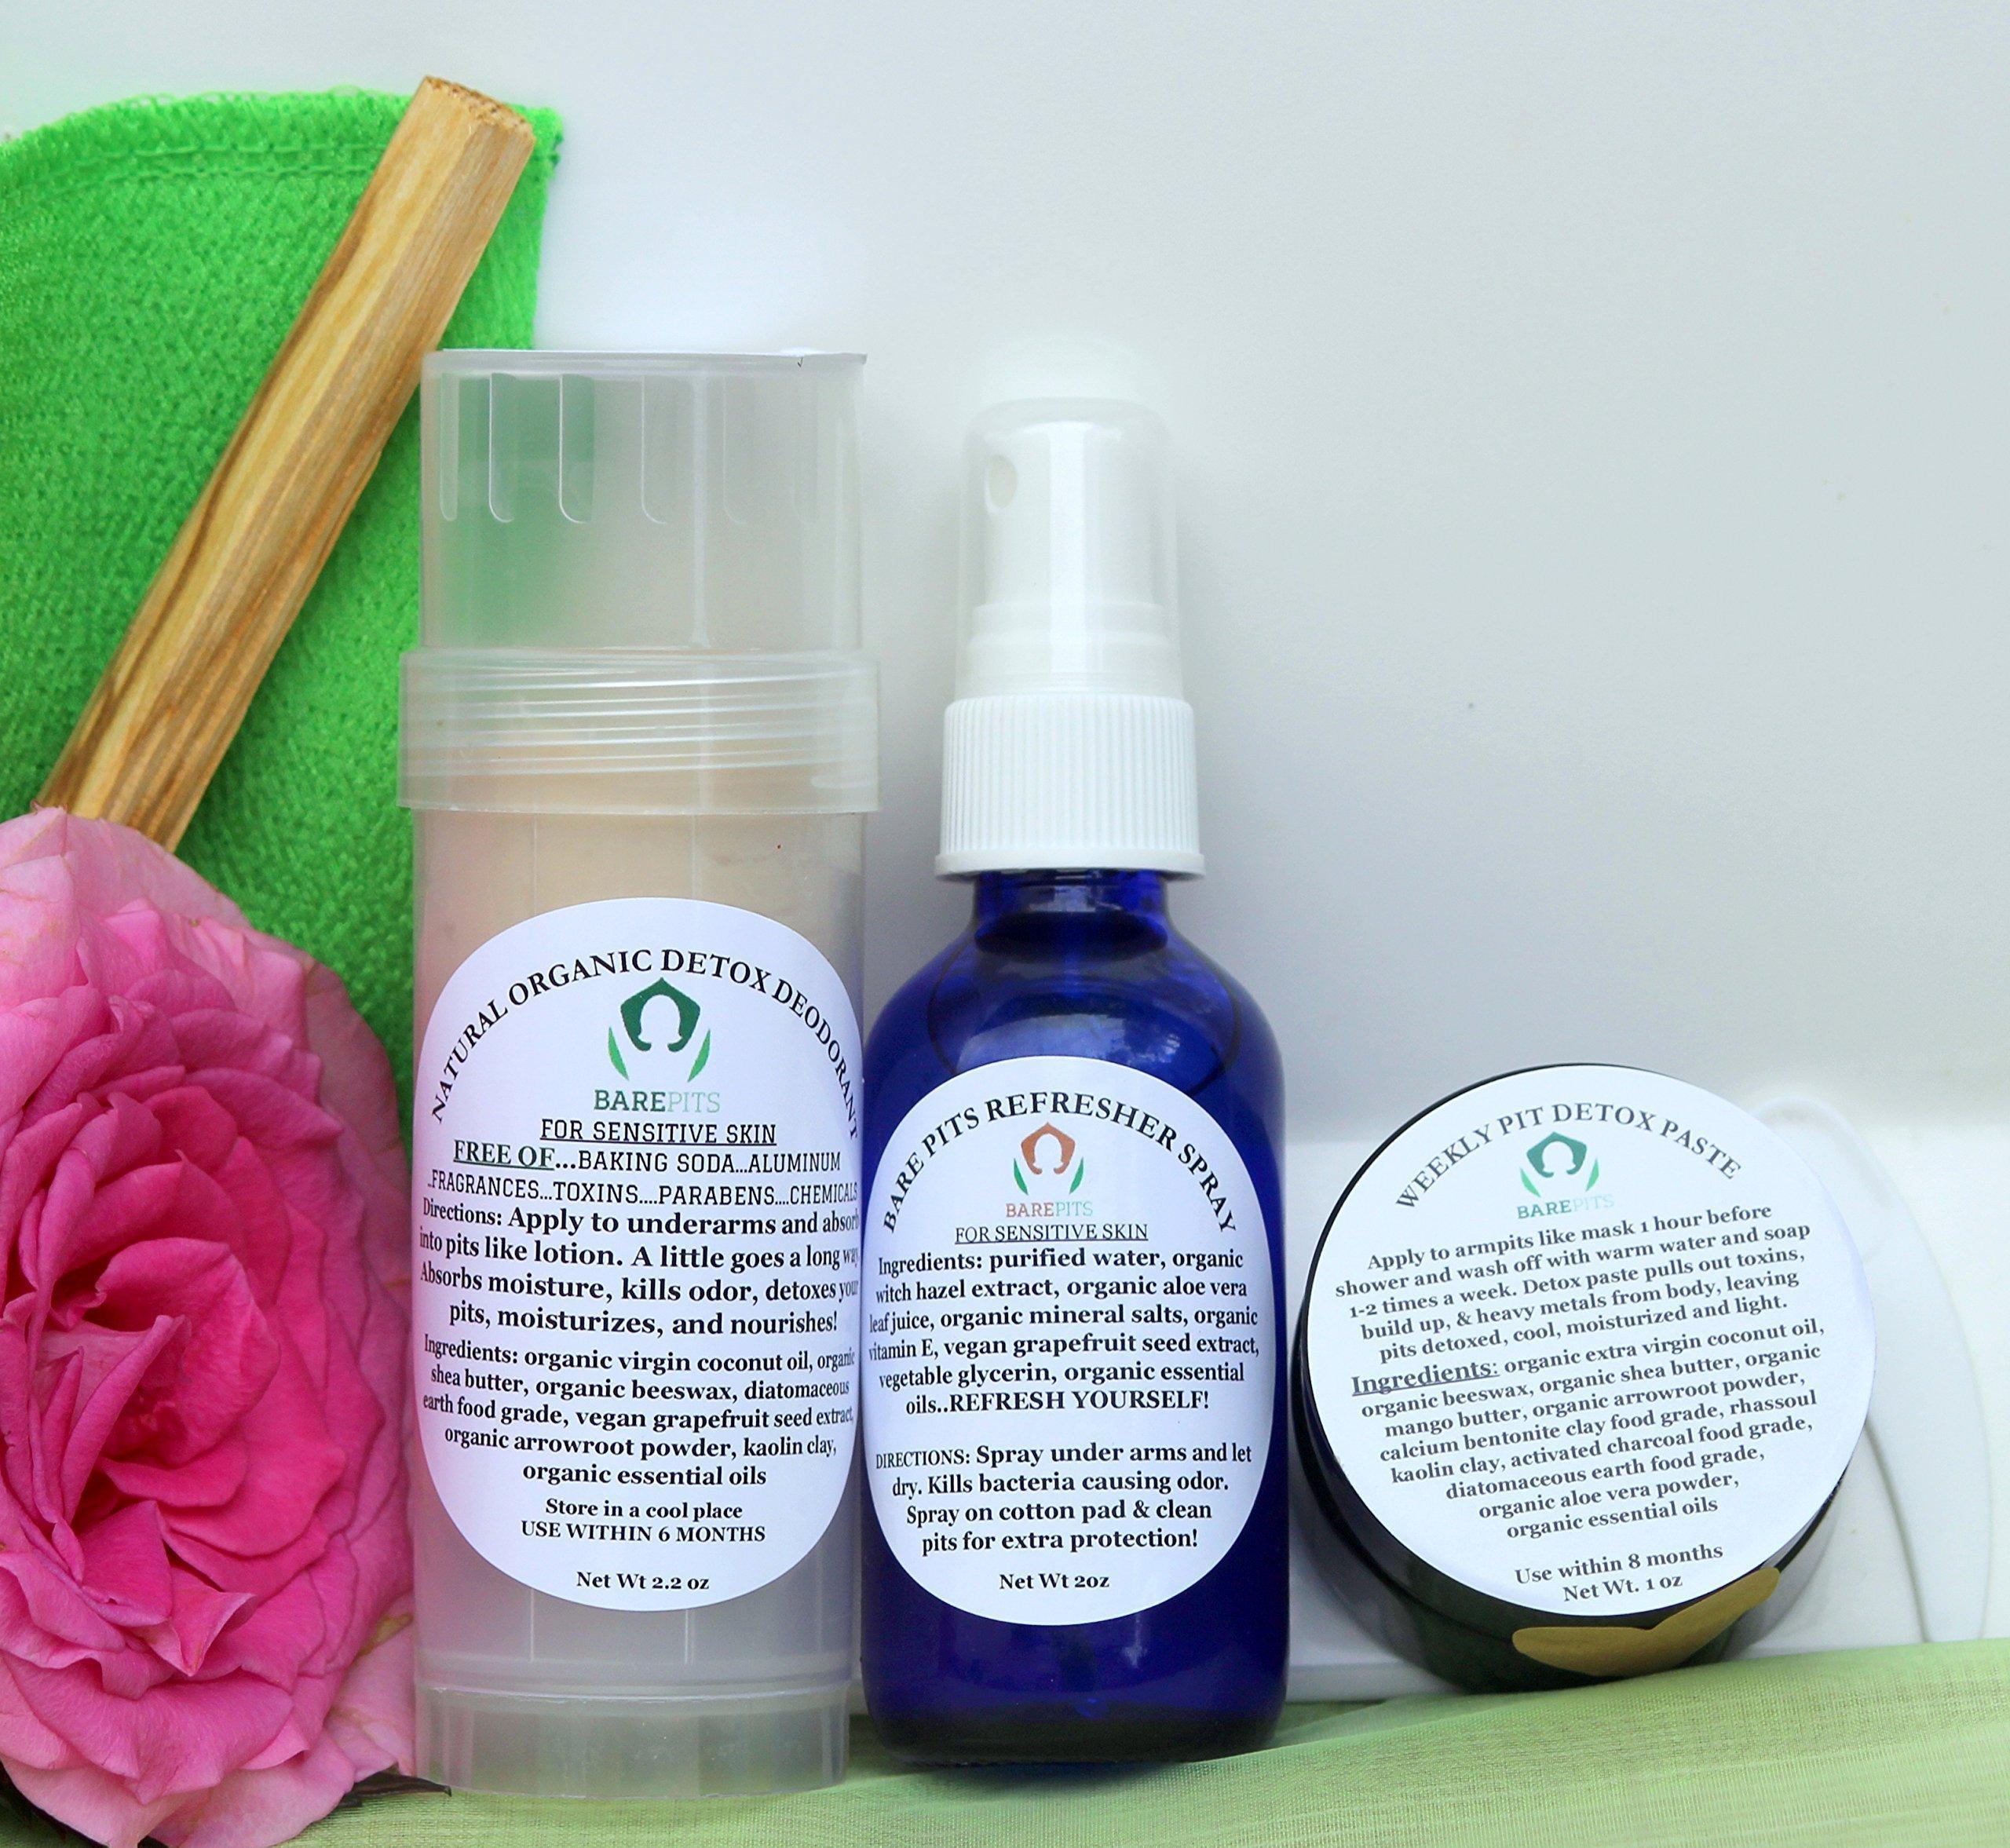 Bare Pits Natural Organic Detox 3 Piece PIT KIT REG/XTRA Deodorant, Pit Refresher Spray, Detox Pit Paste NO Baking Soda.For Sensitive Skin